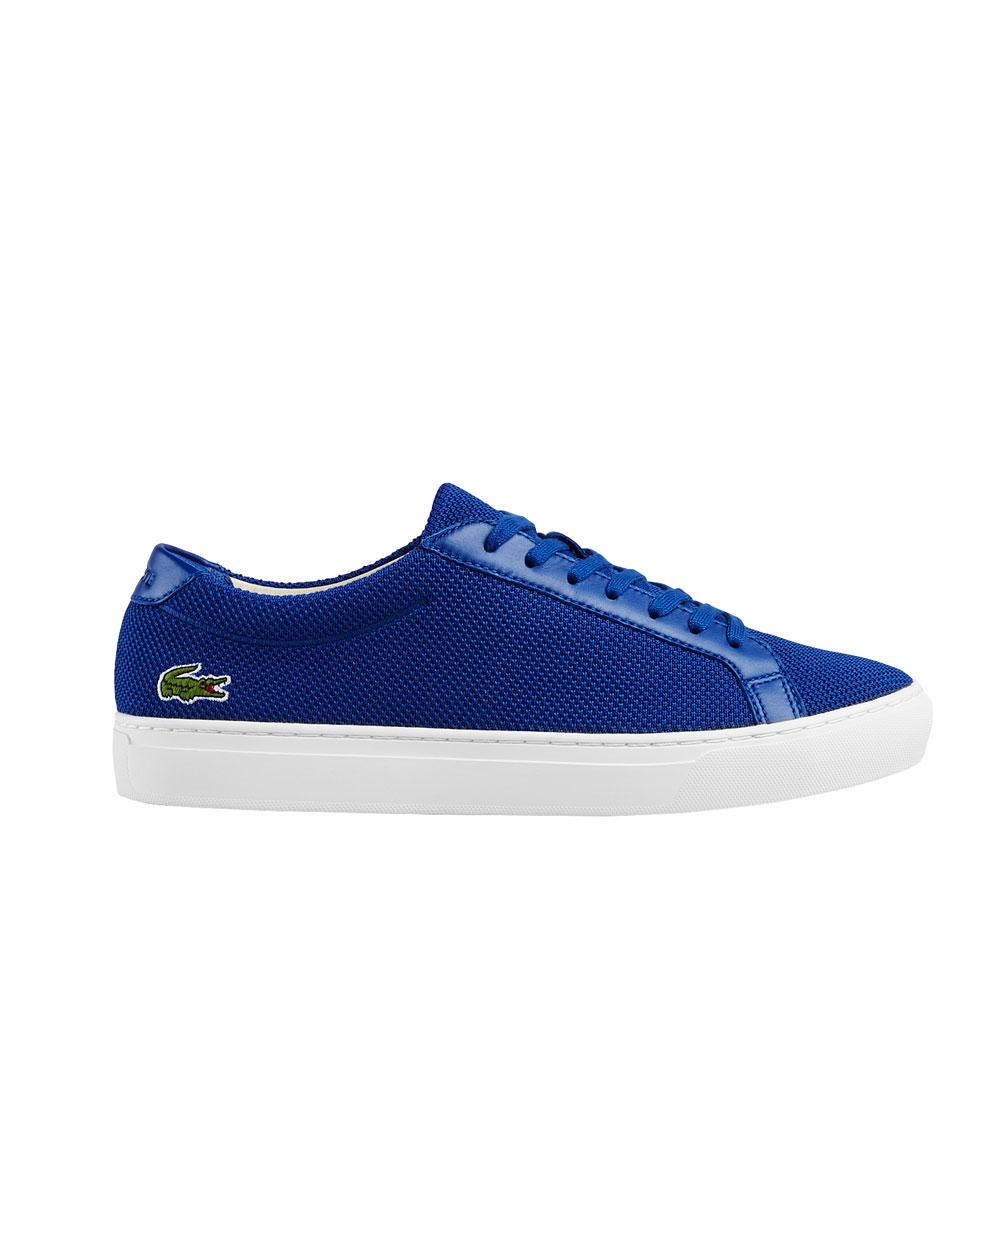 Lacoste L12.12 117 1 Cam (dark blue)